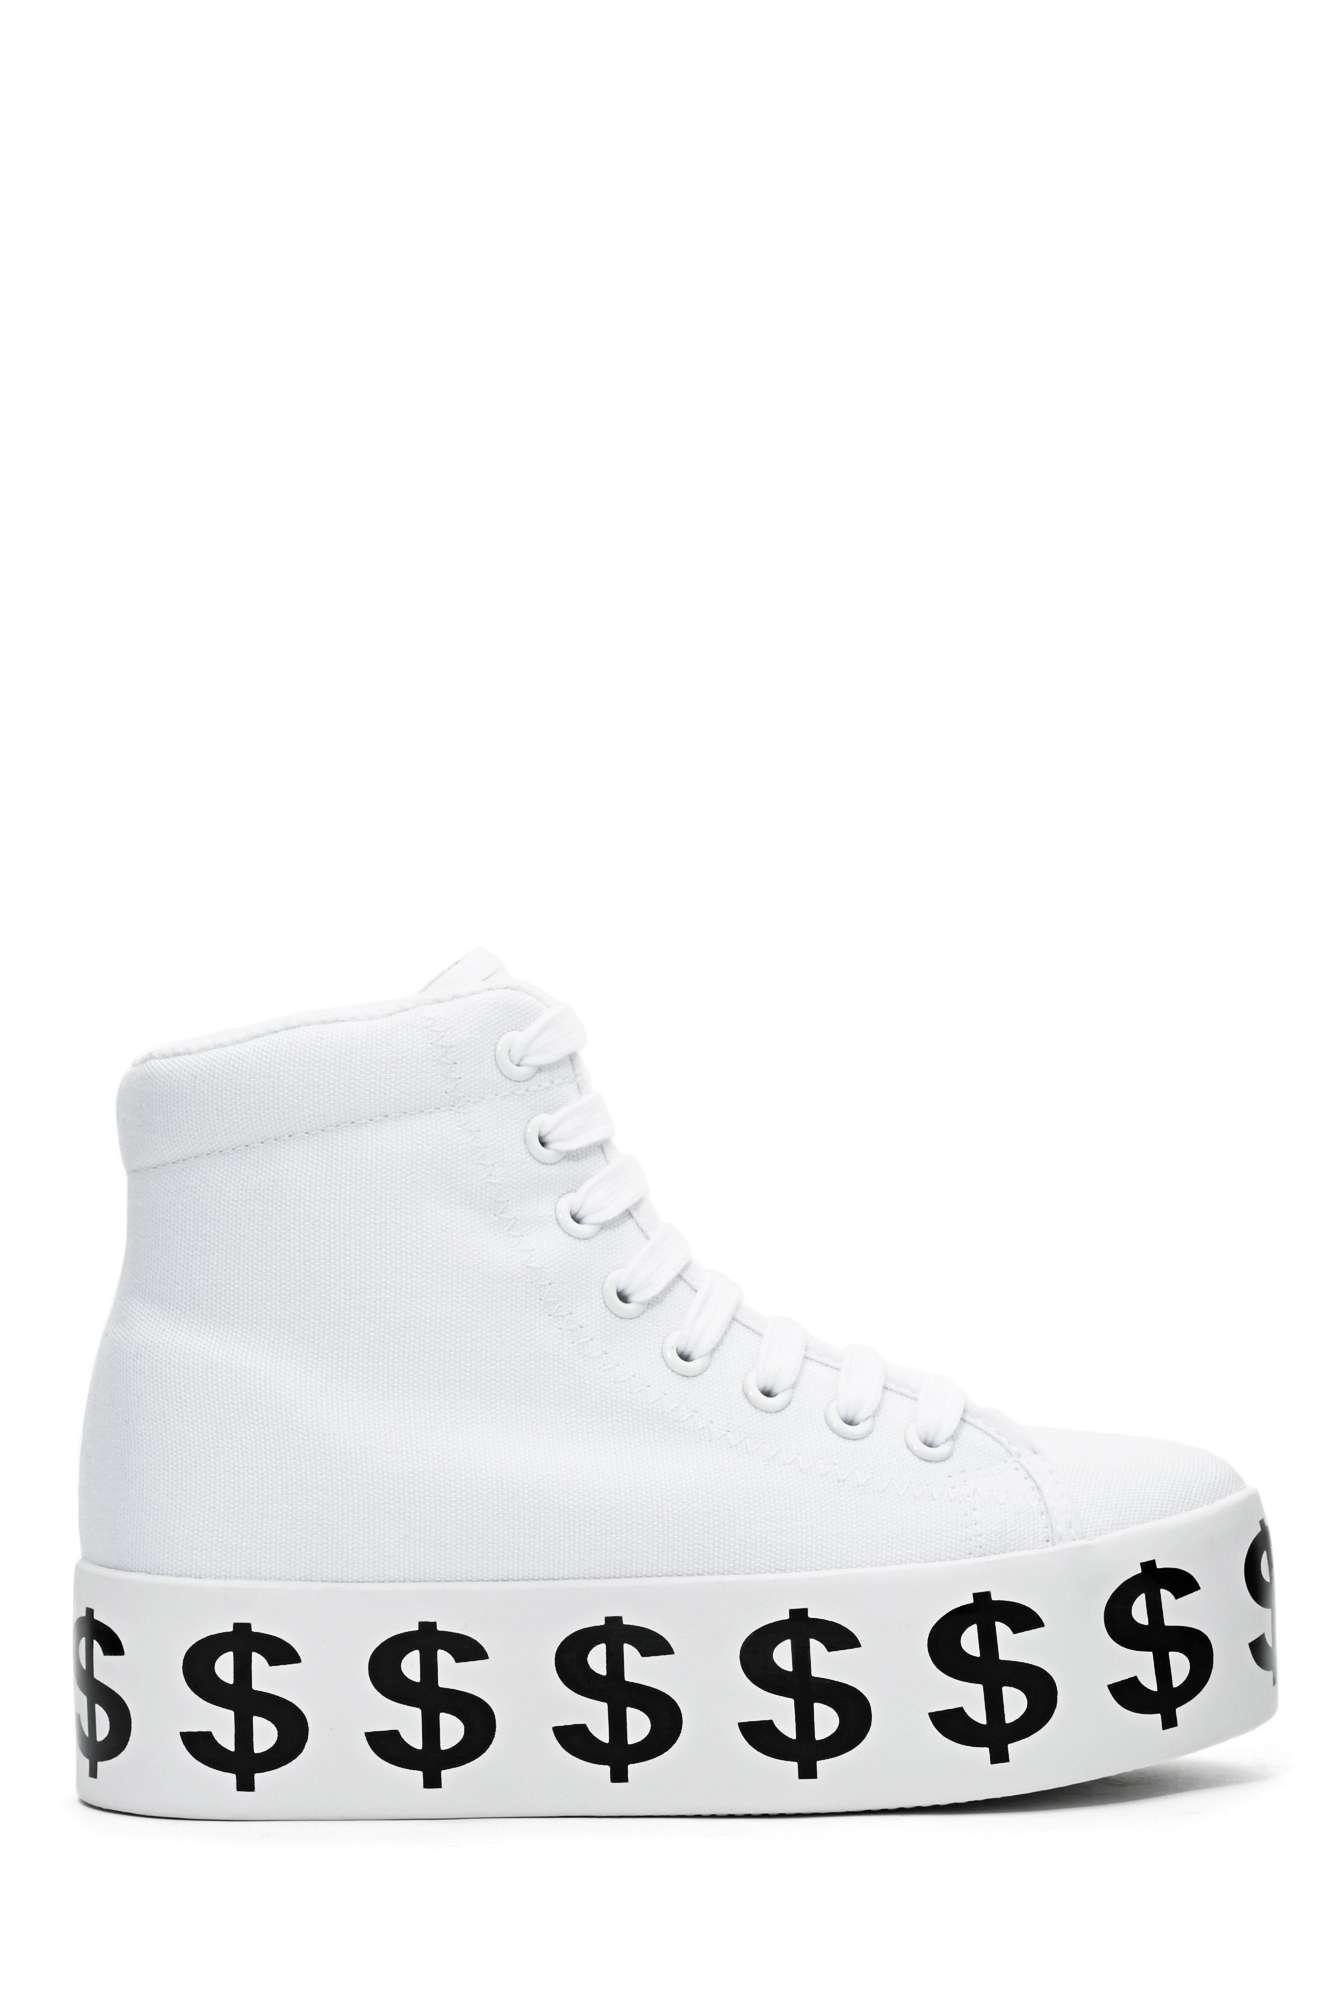 Jeffrey campbell dolla platform sneaker